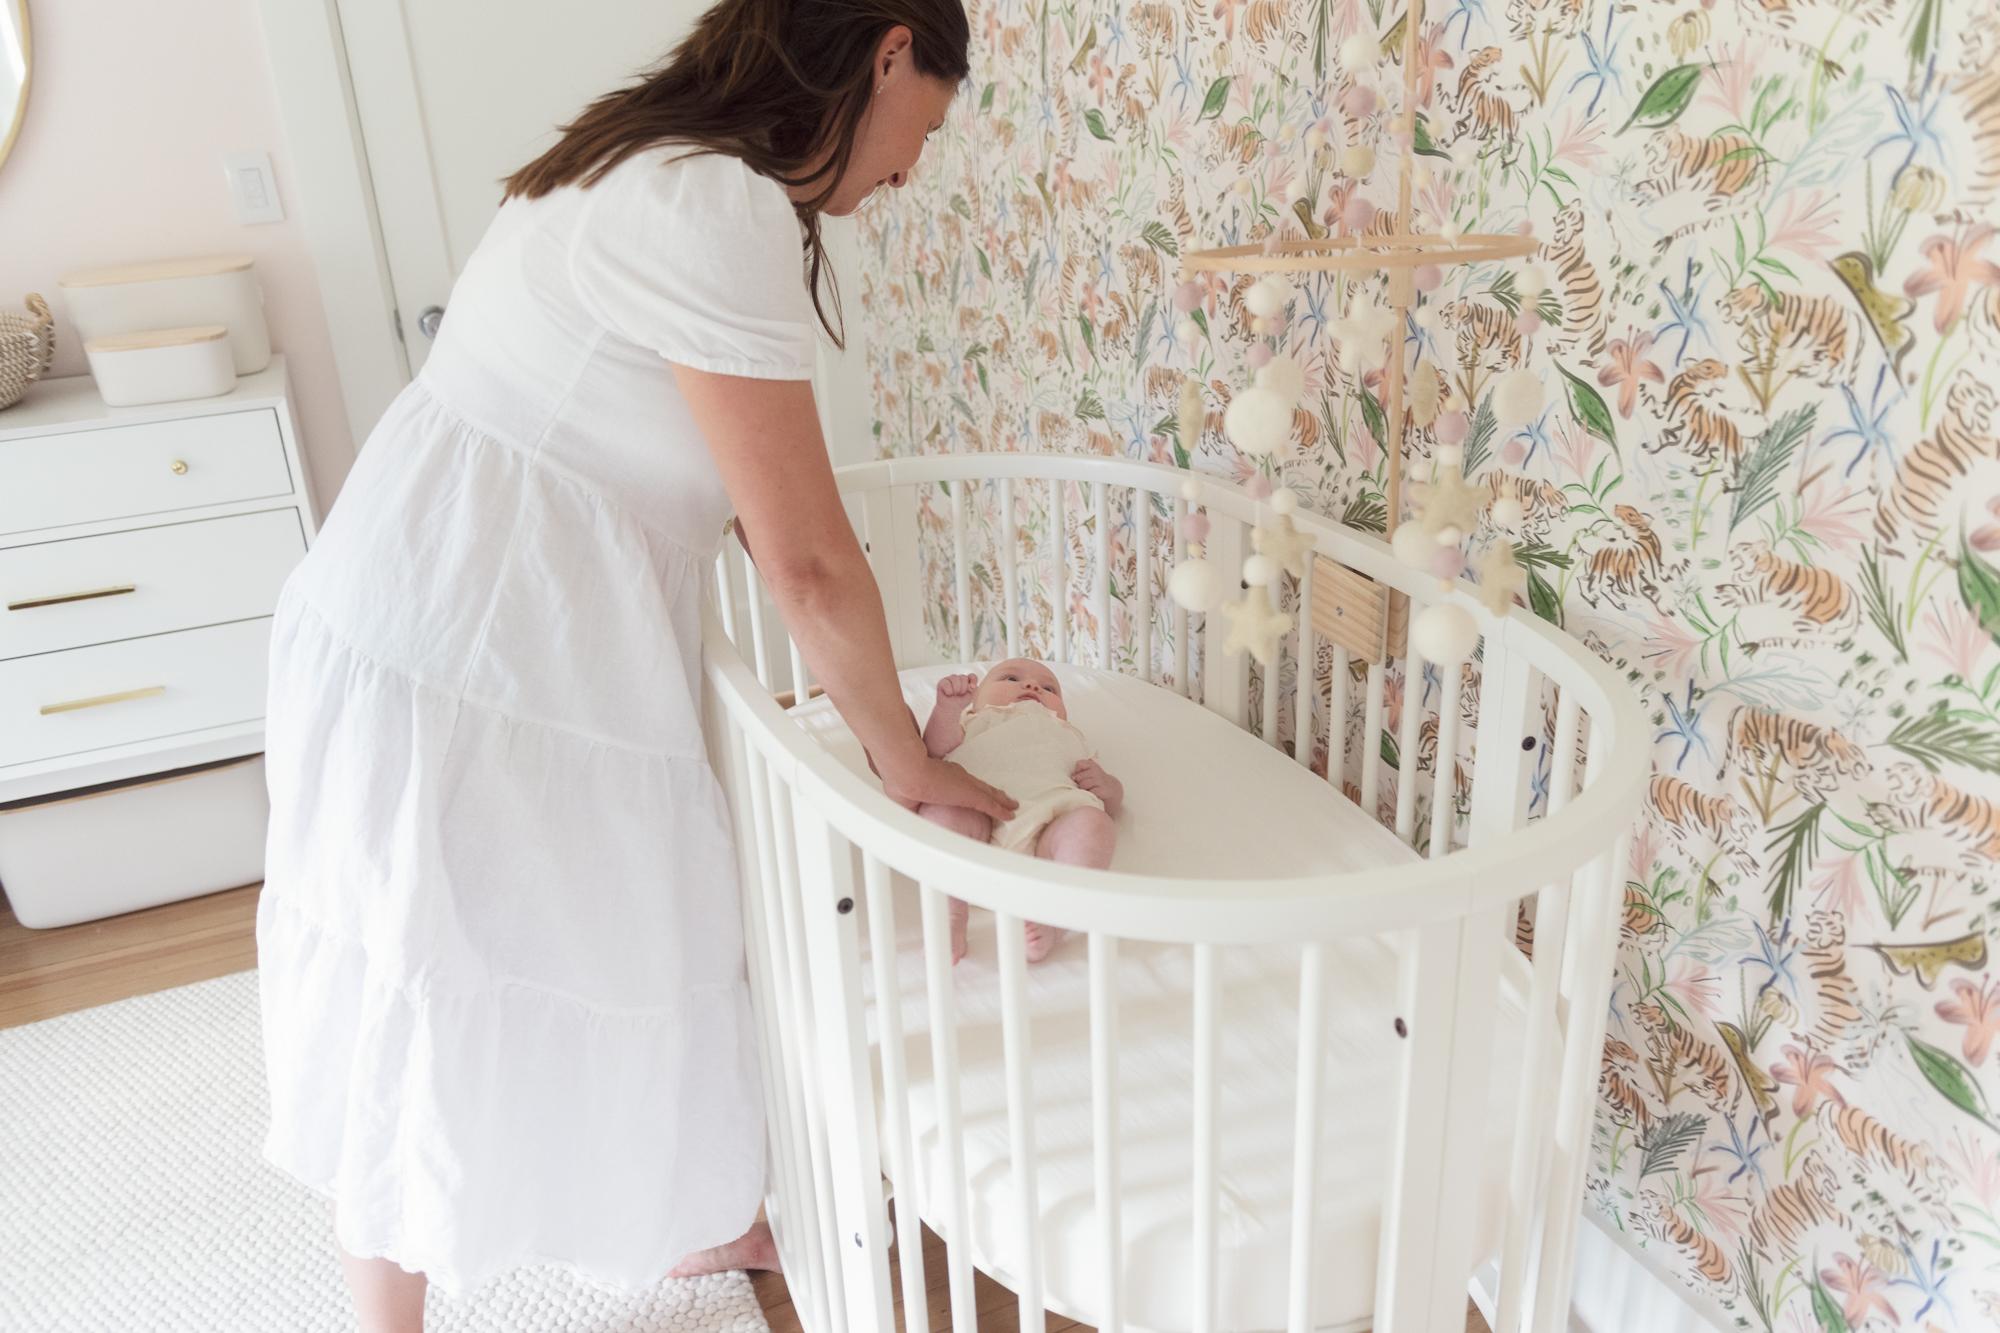 Girly Jungle Wallpaper with Sleepi Oval Crib in Nursery